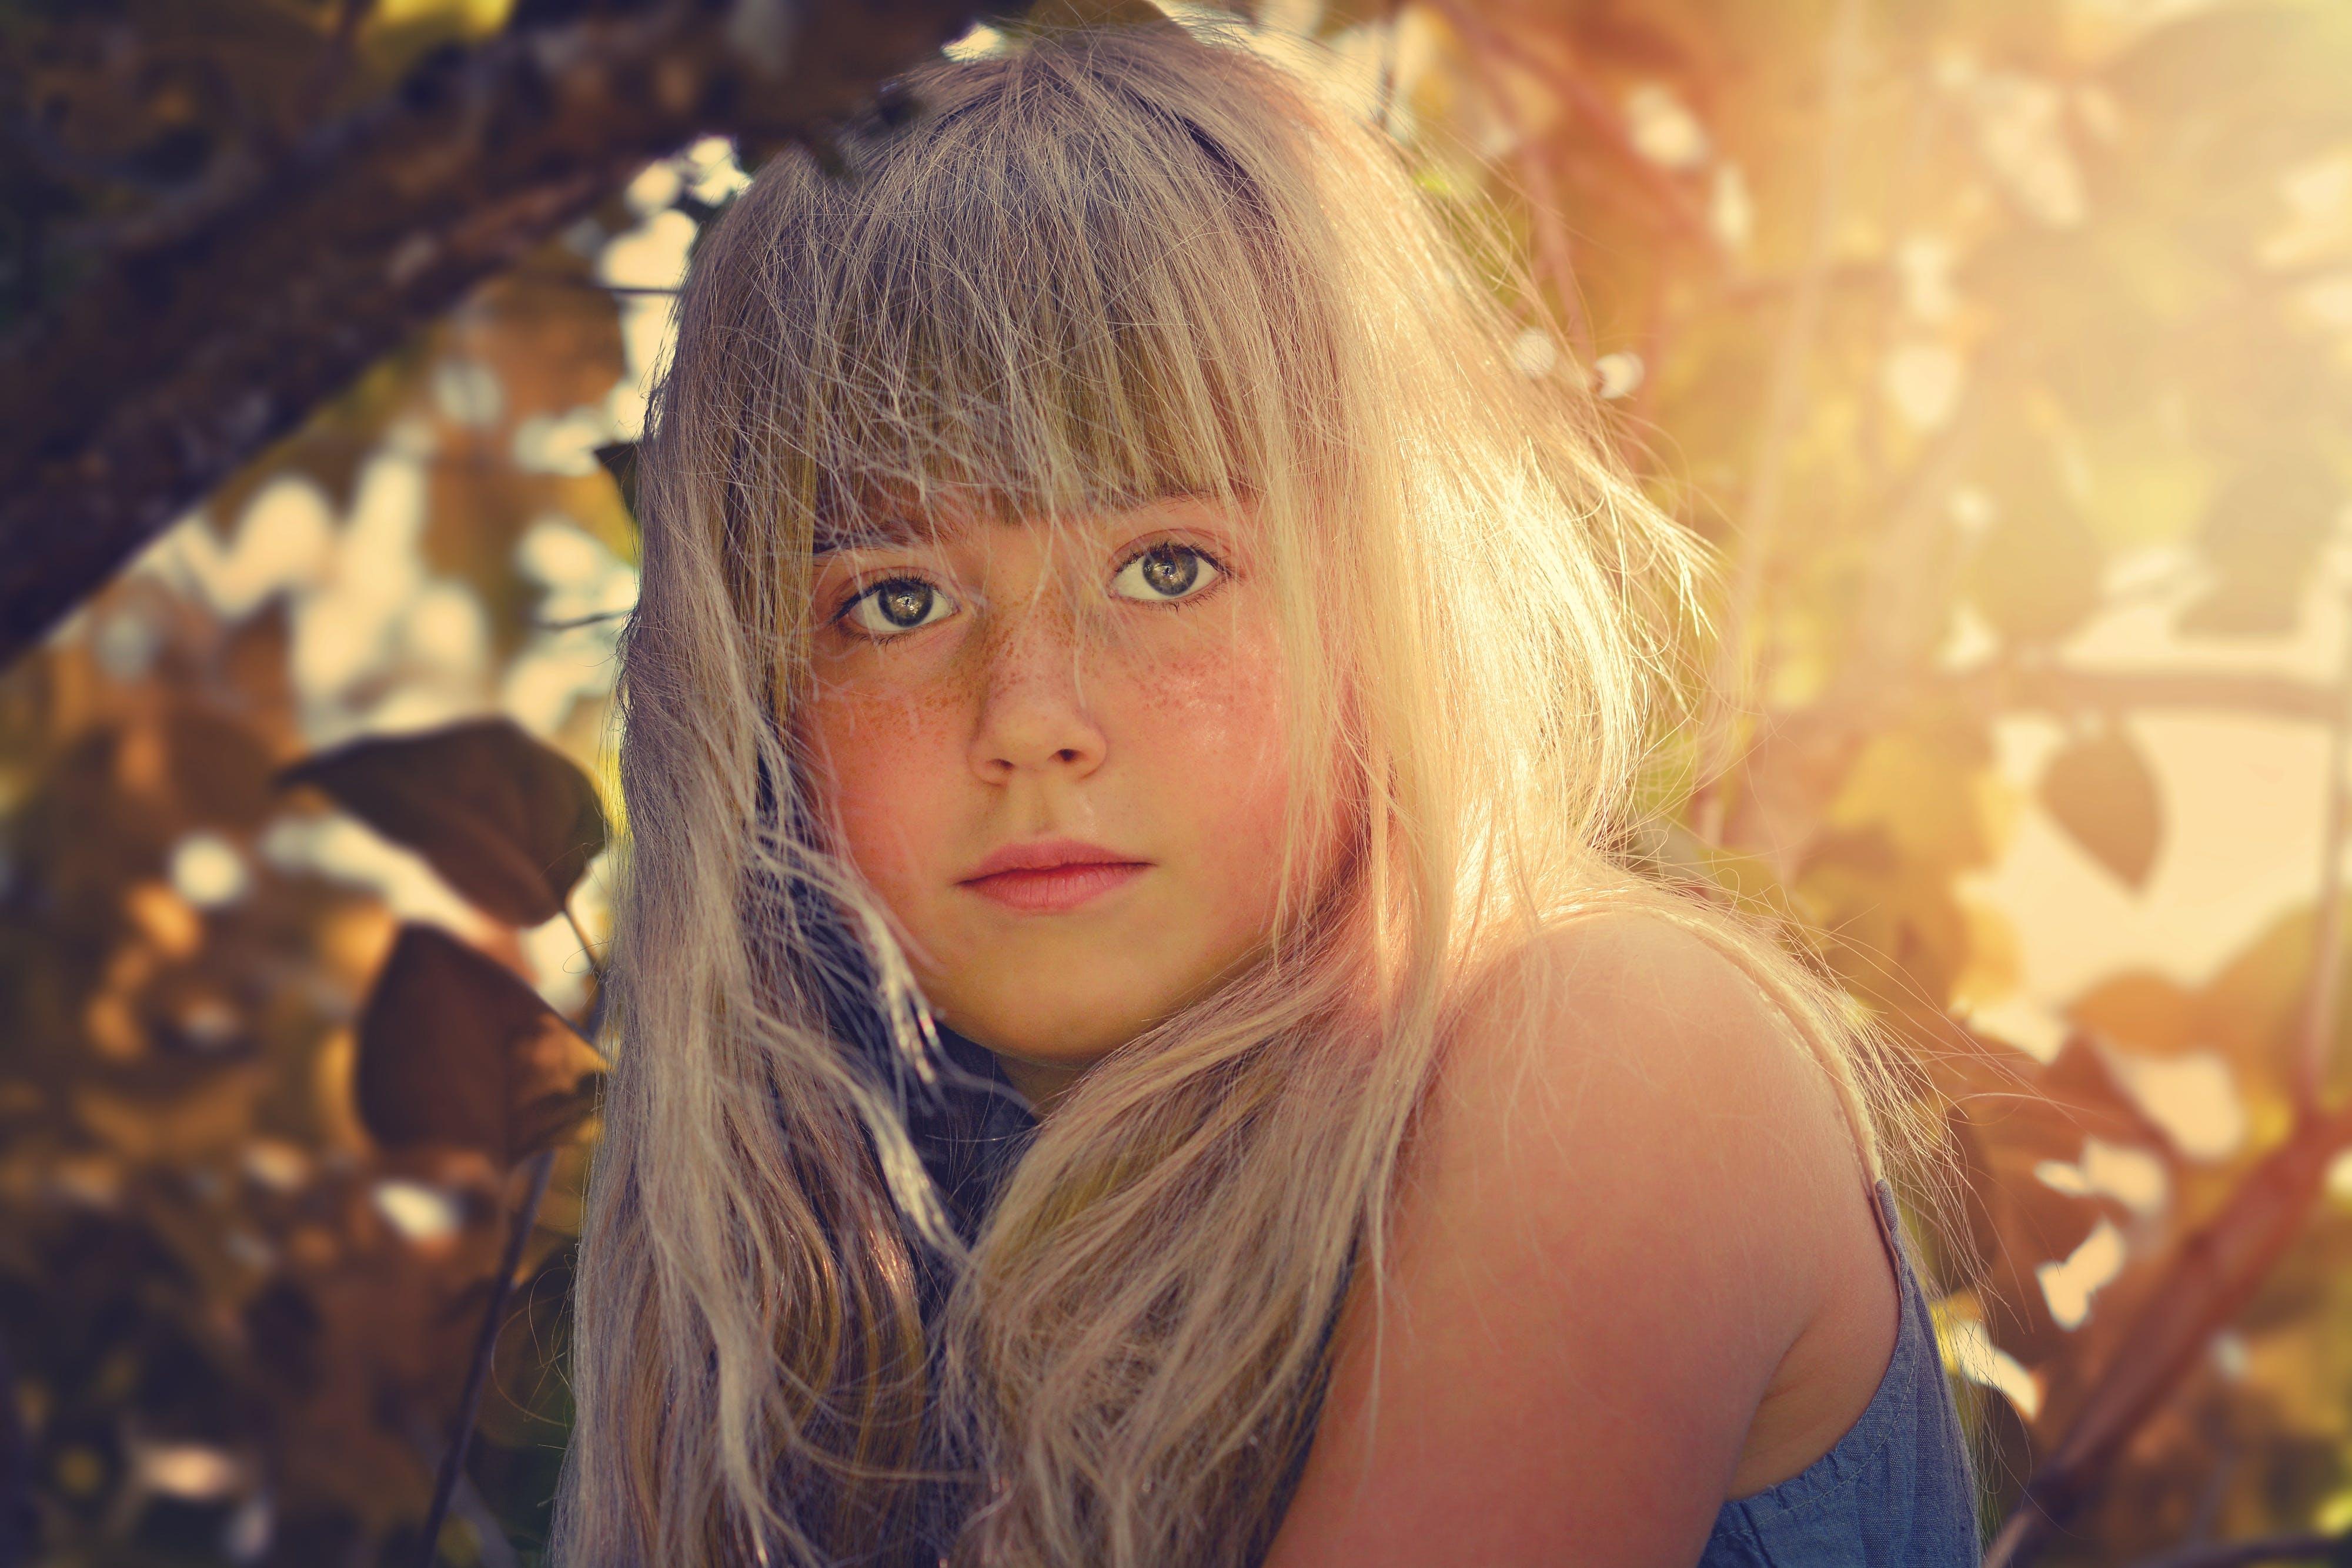 beauty, blonde, child